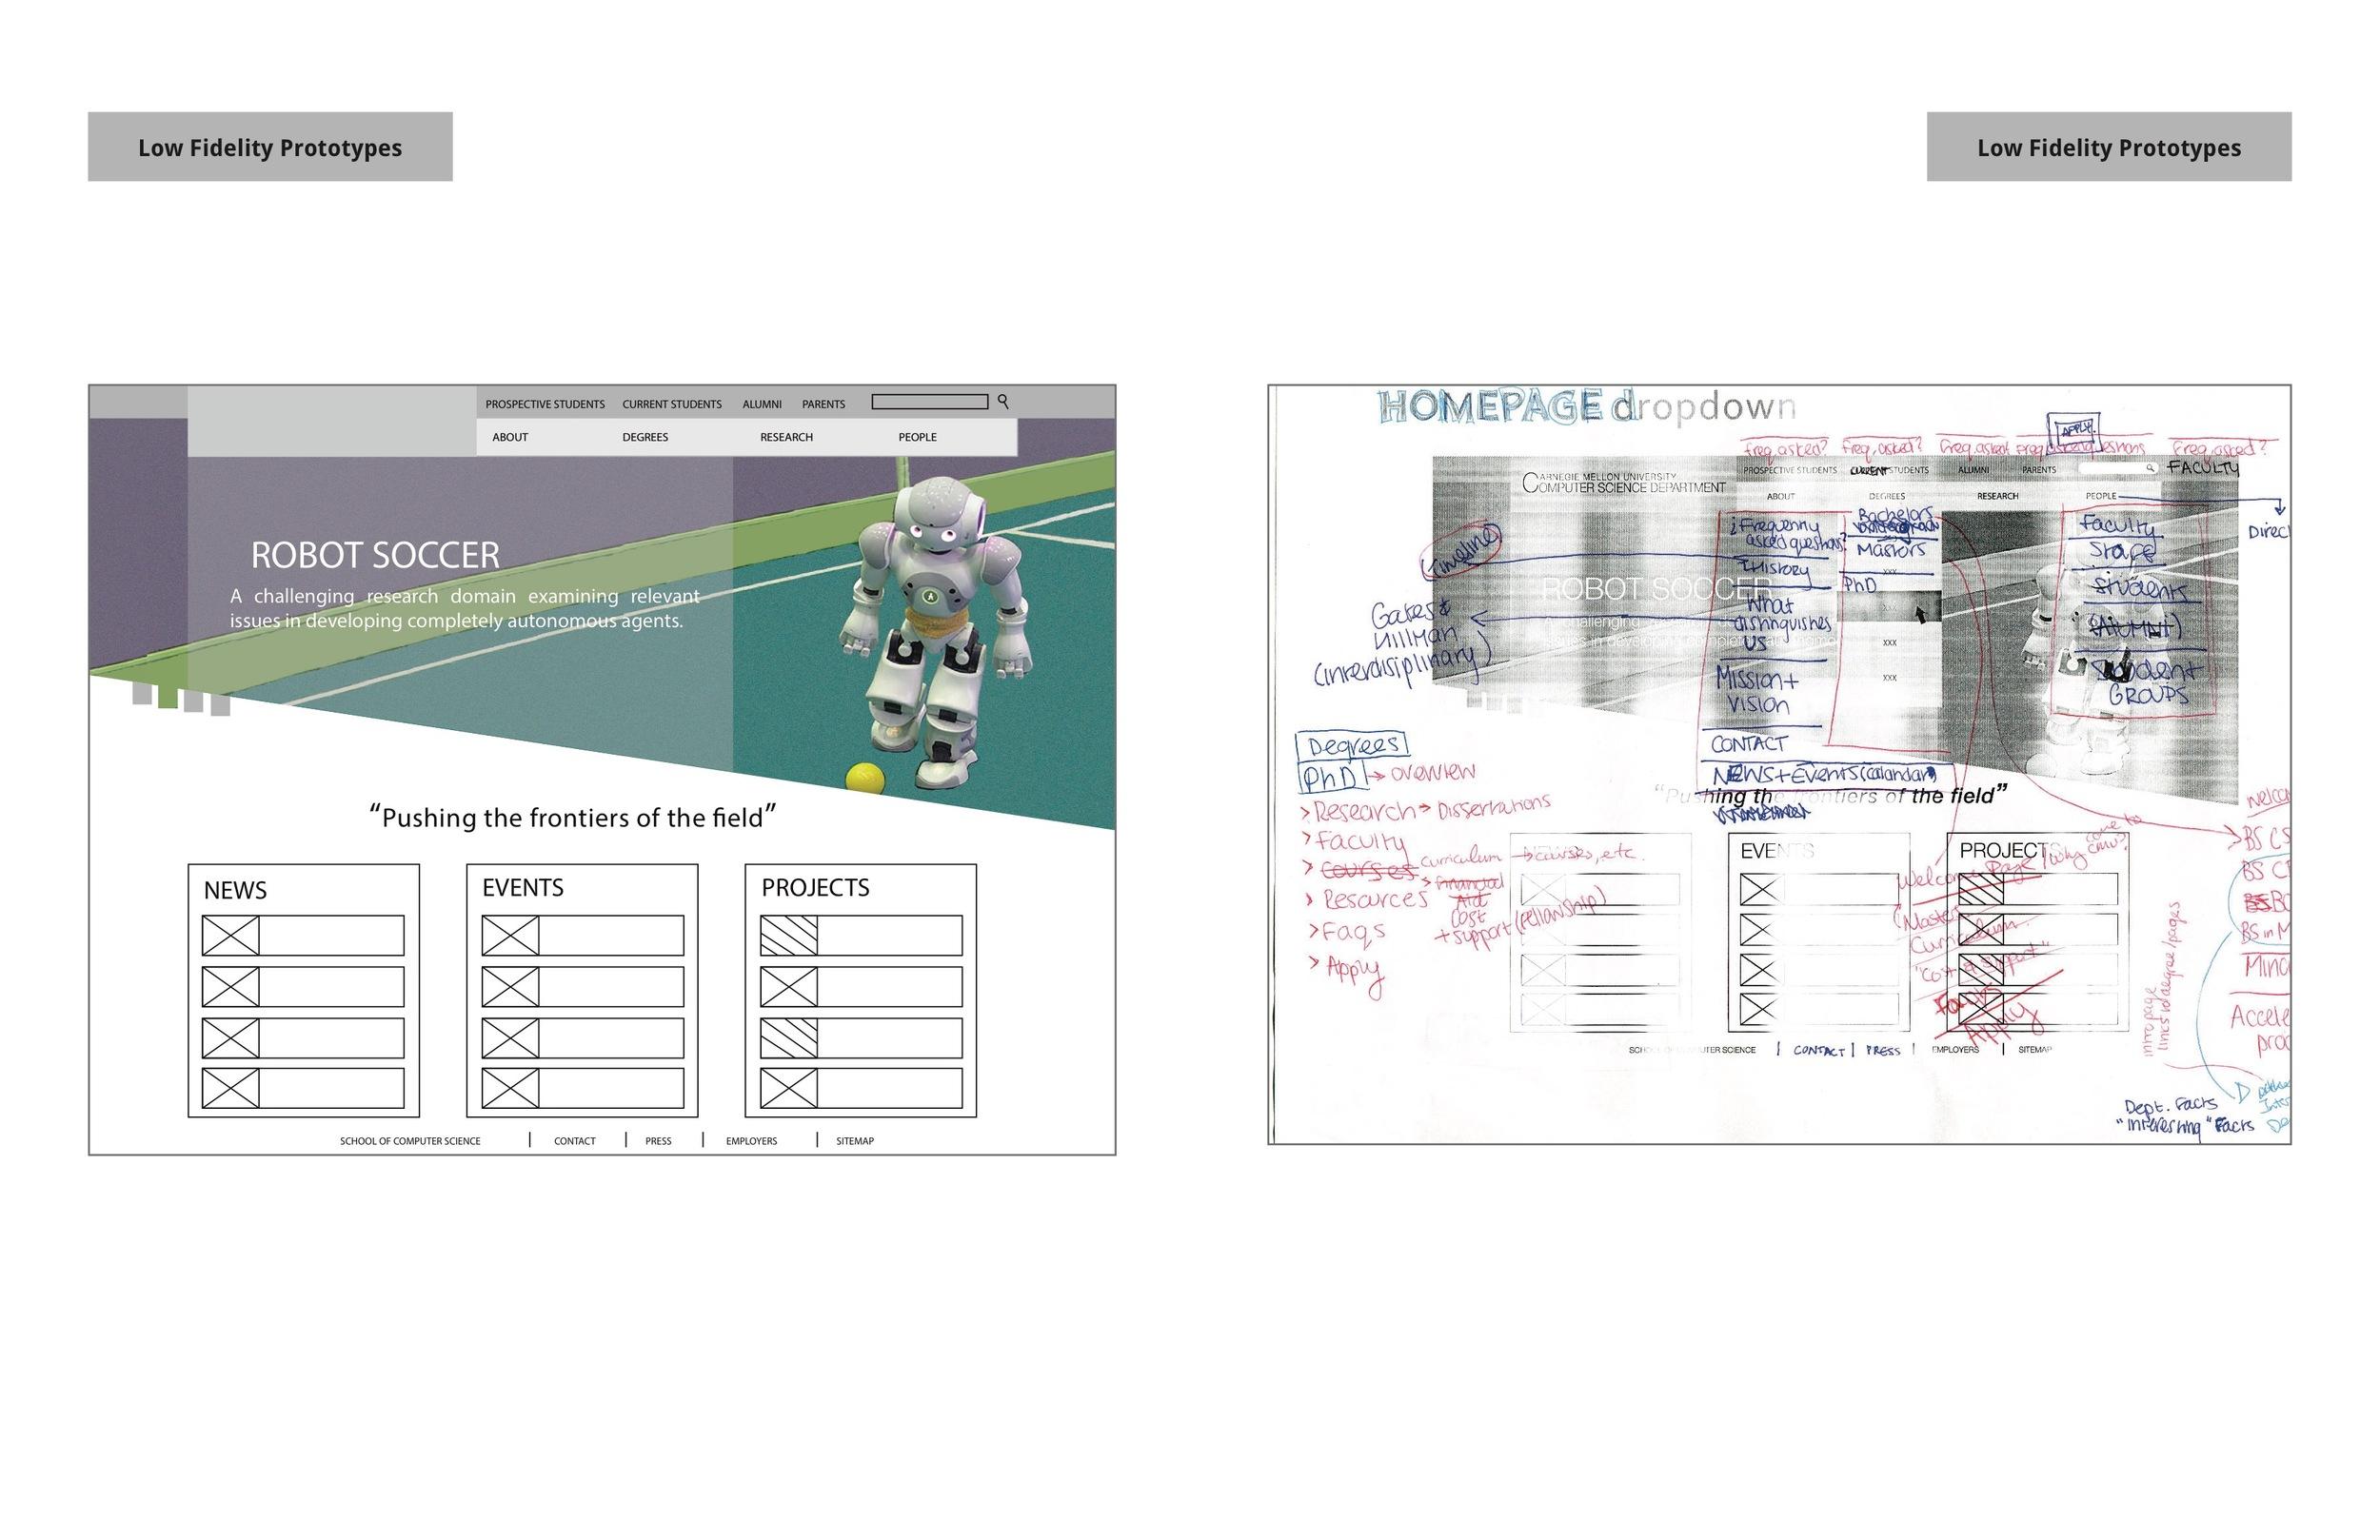 finalreport_spreads 17-17.jpeg